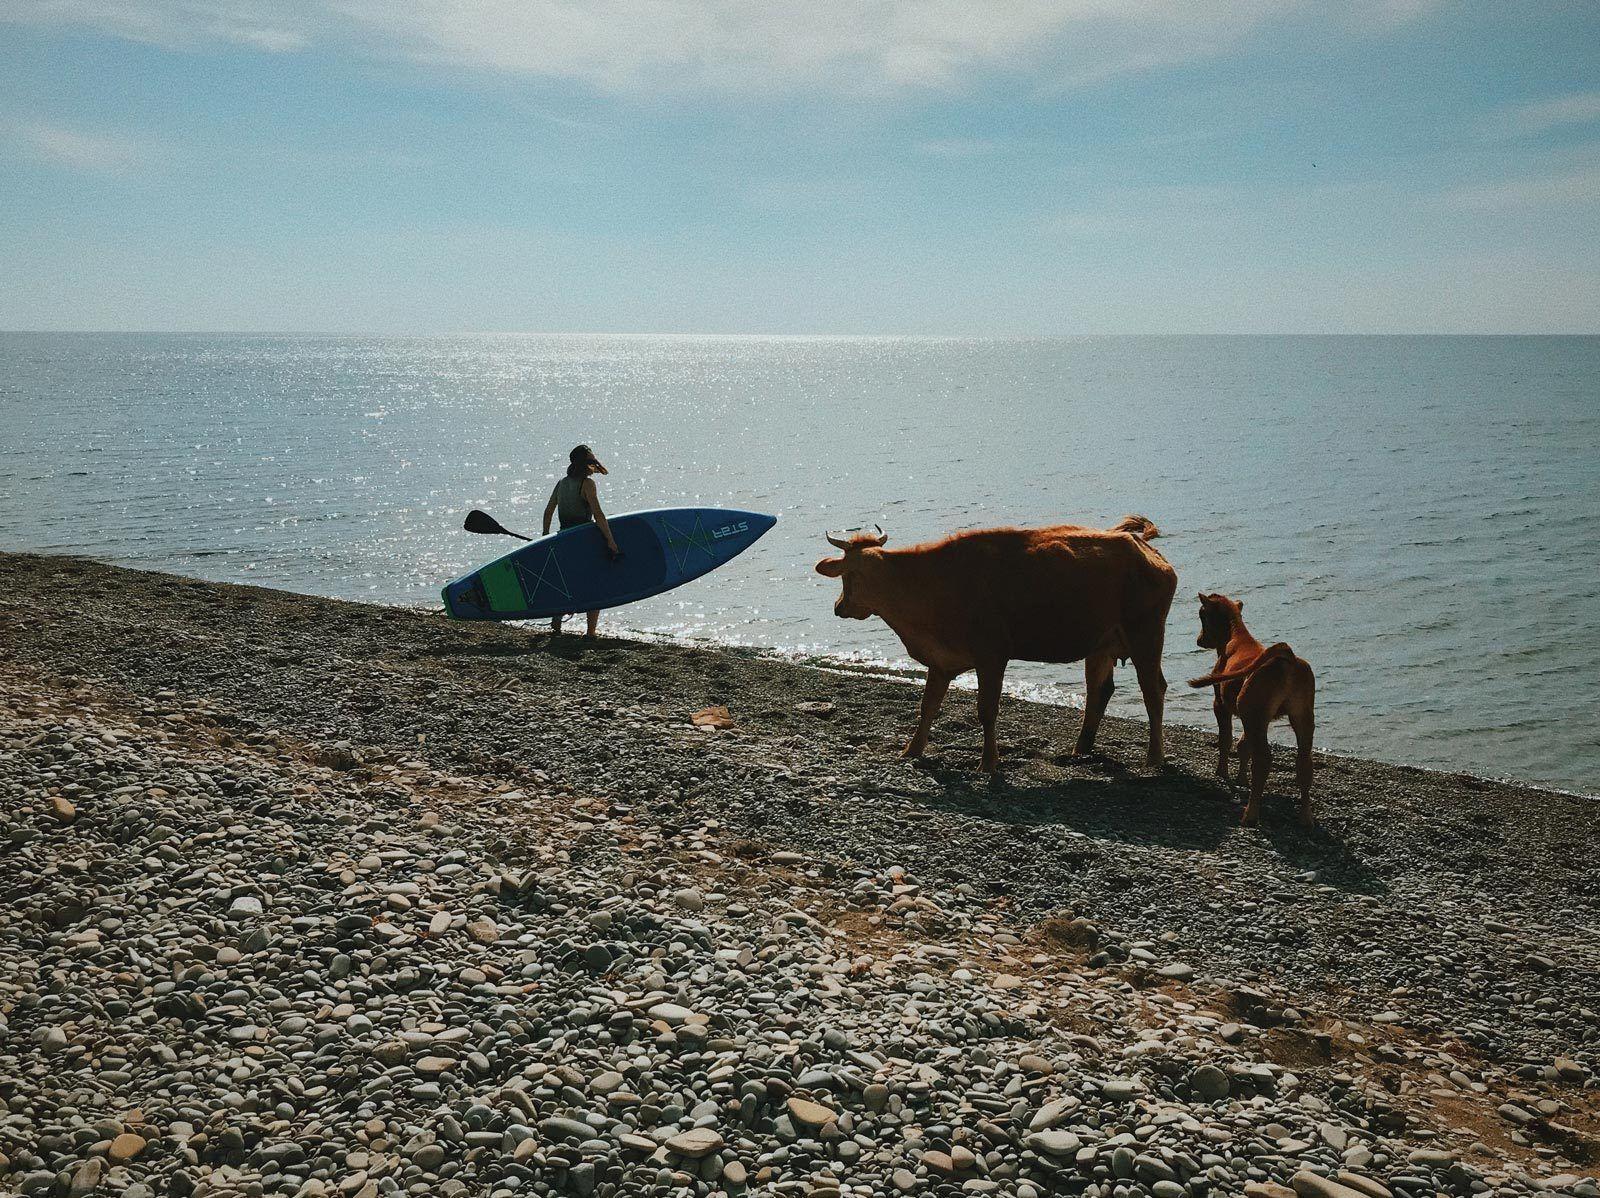 julia-karpacheva-paddleboarding-russia-black-sea-copws-on-the-seaside